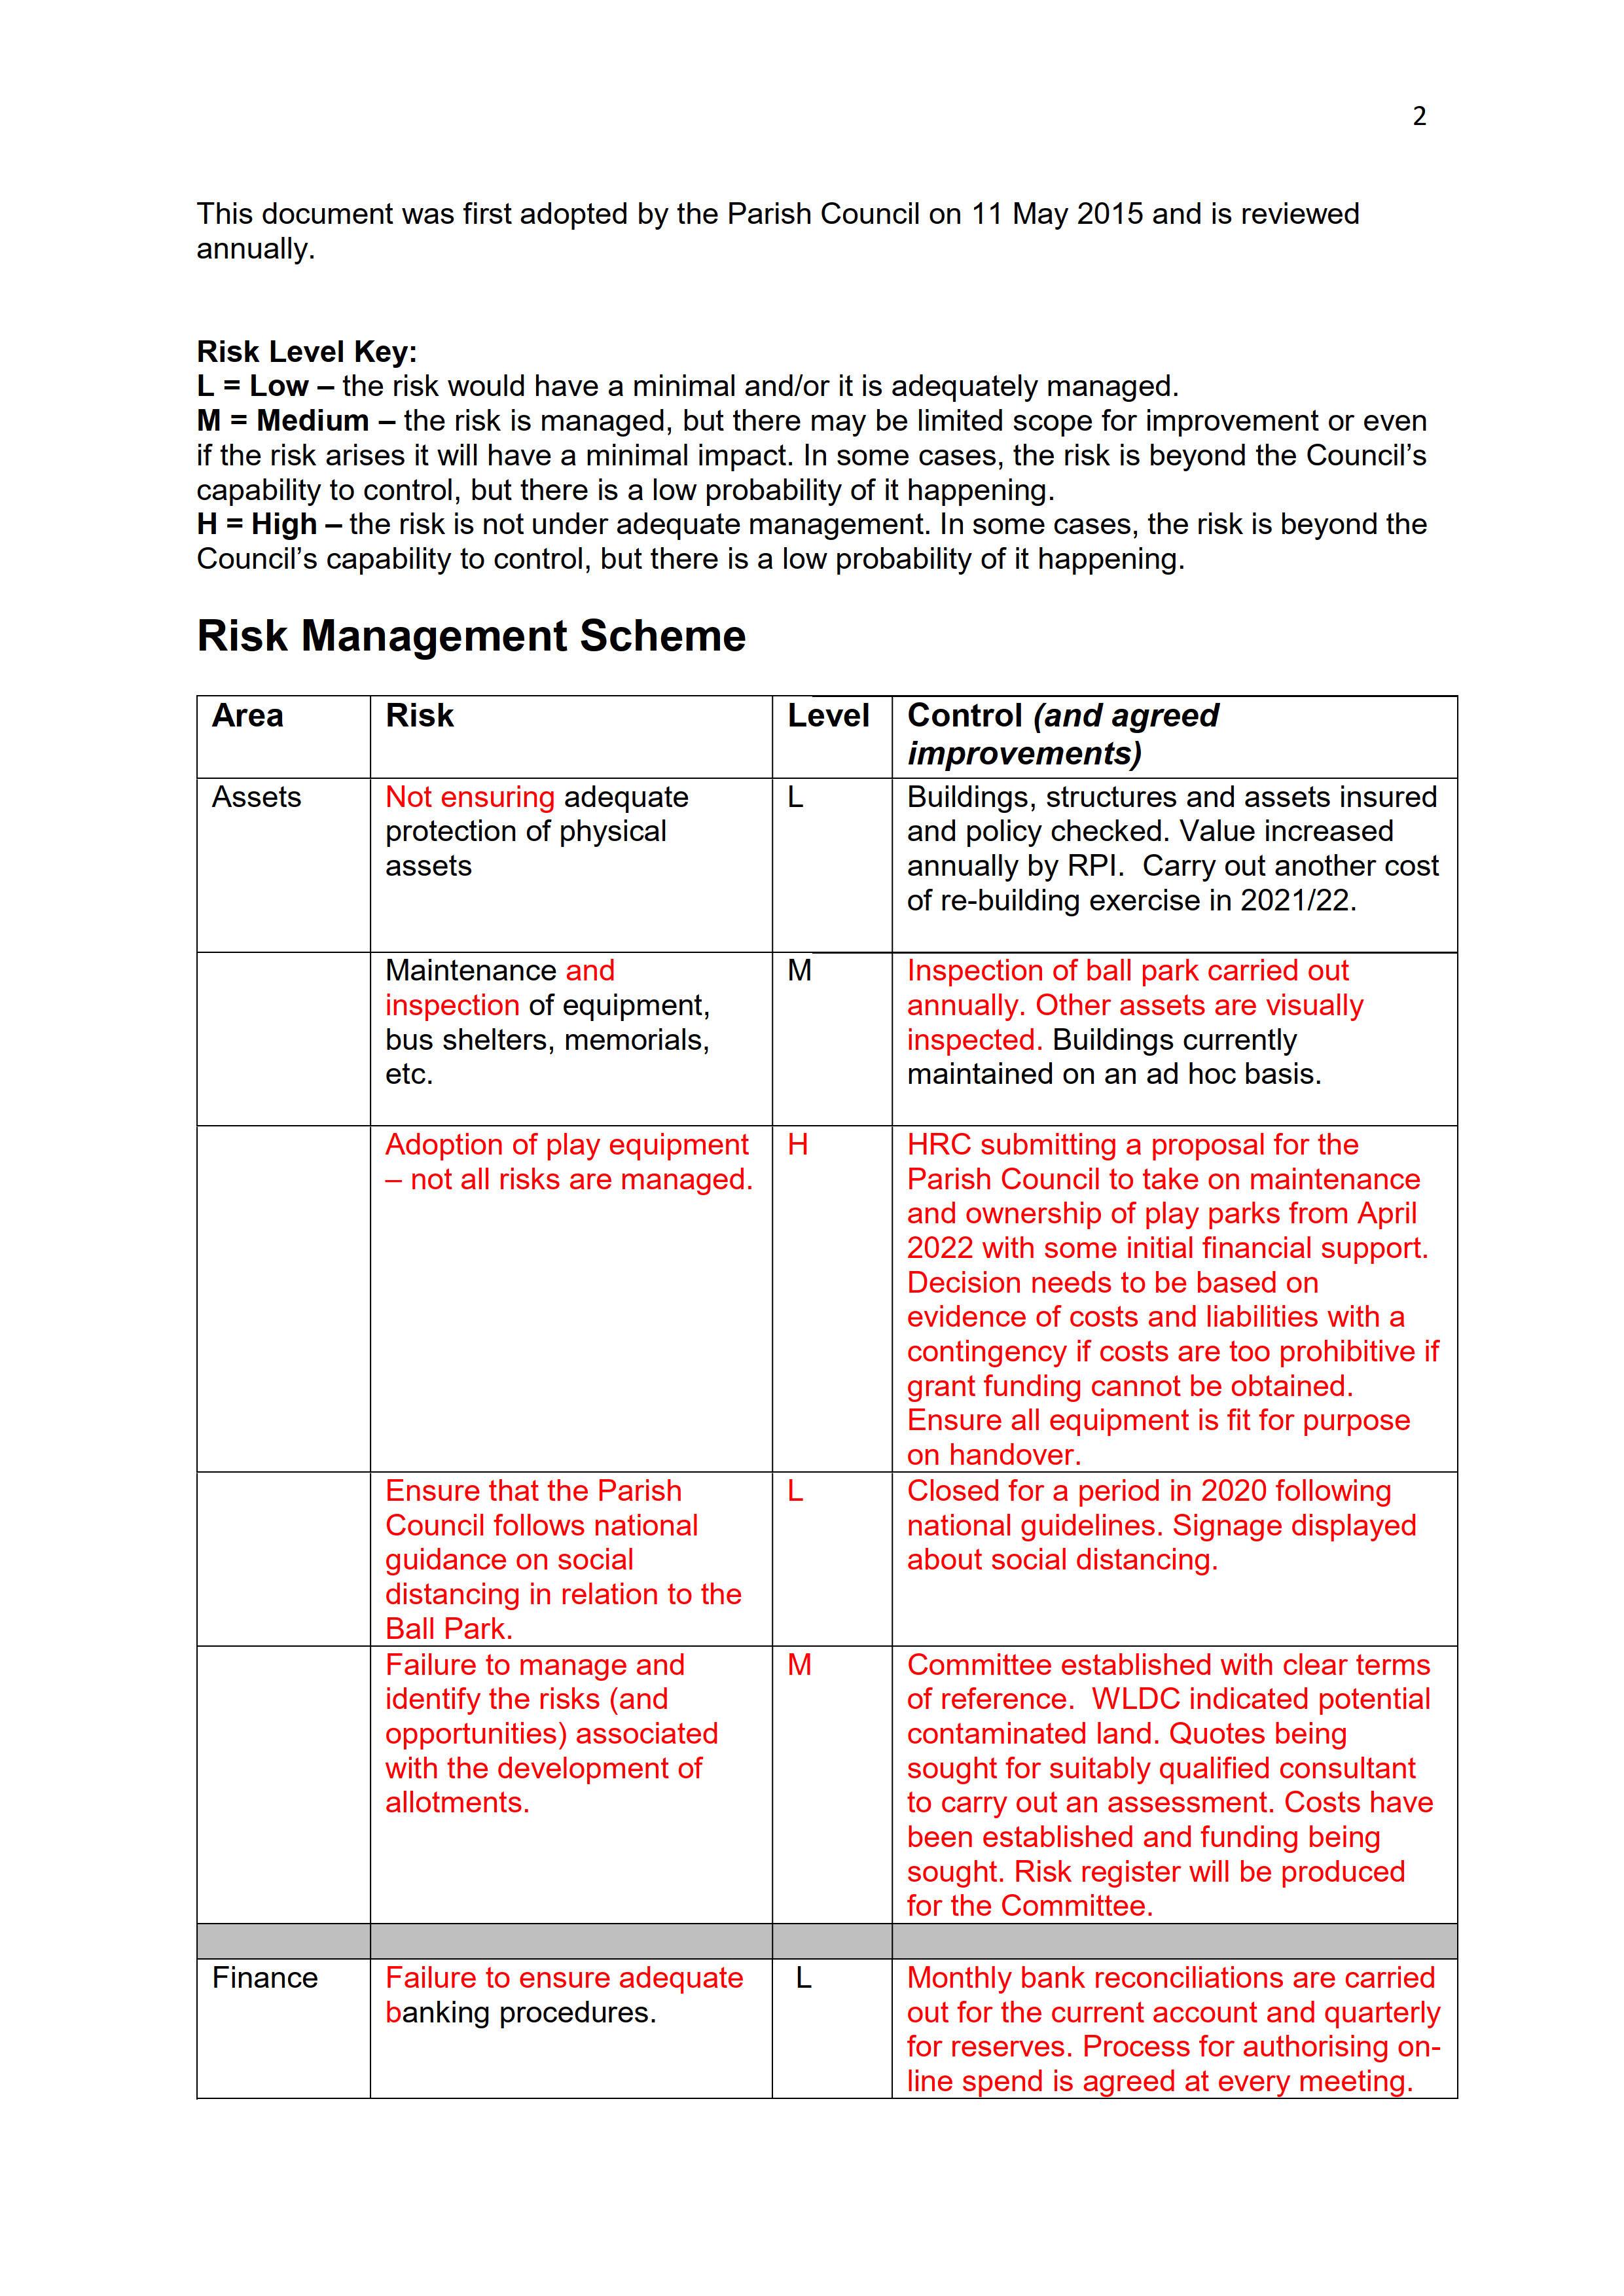 2021HCPC._Risk_Management_2.jpg